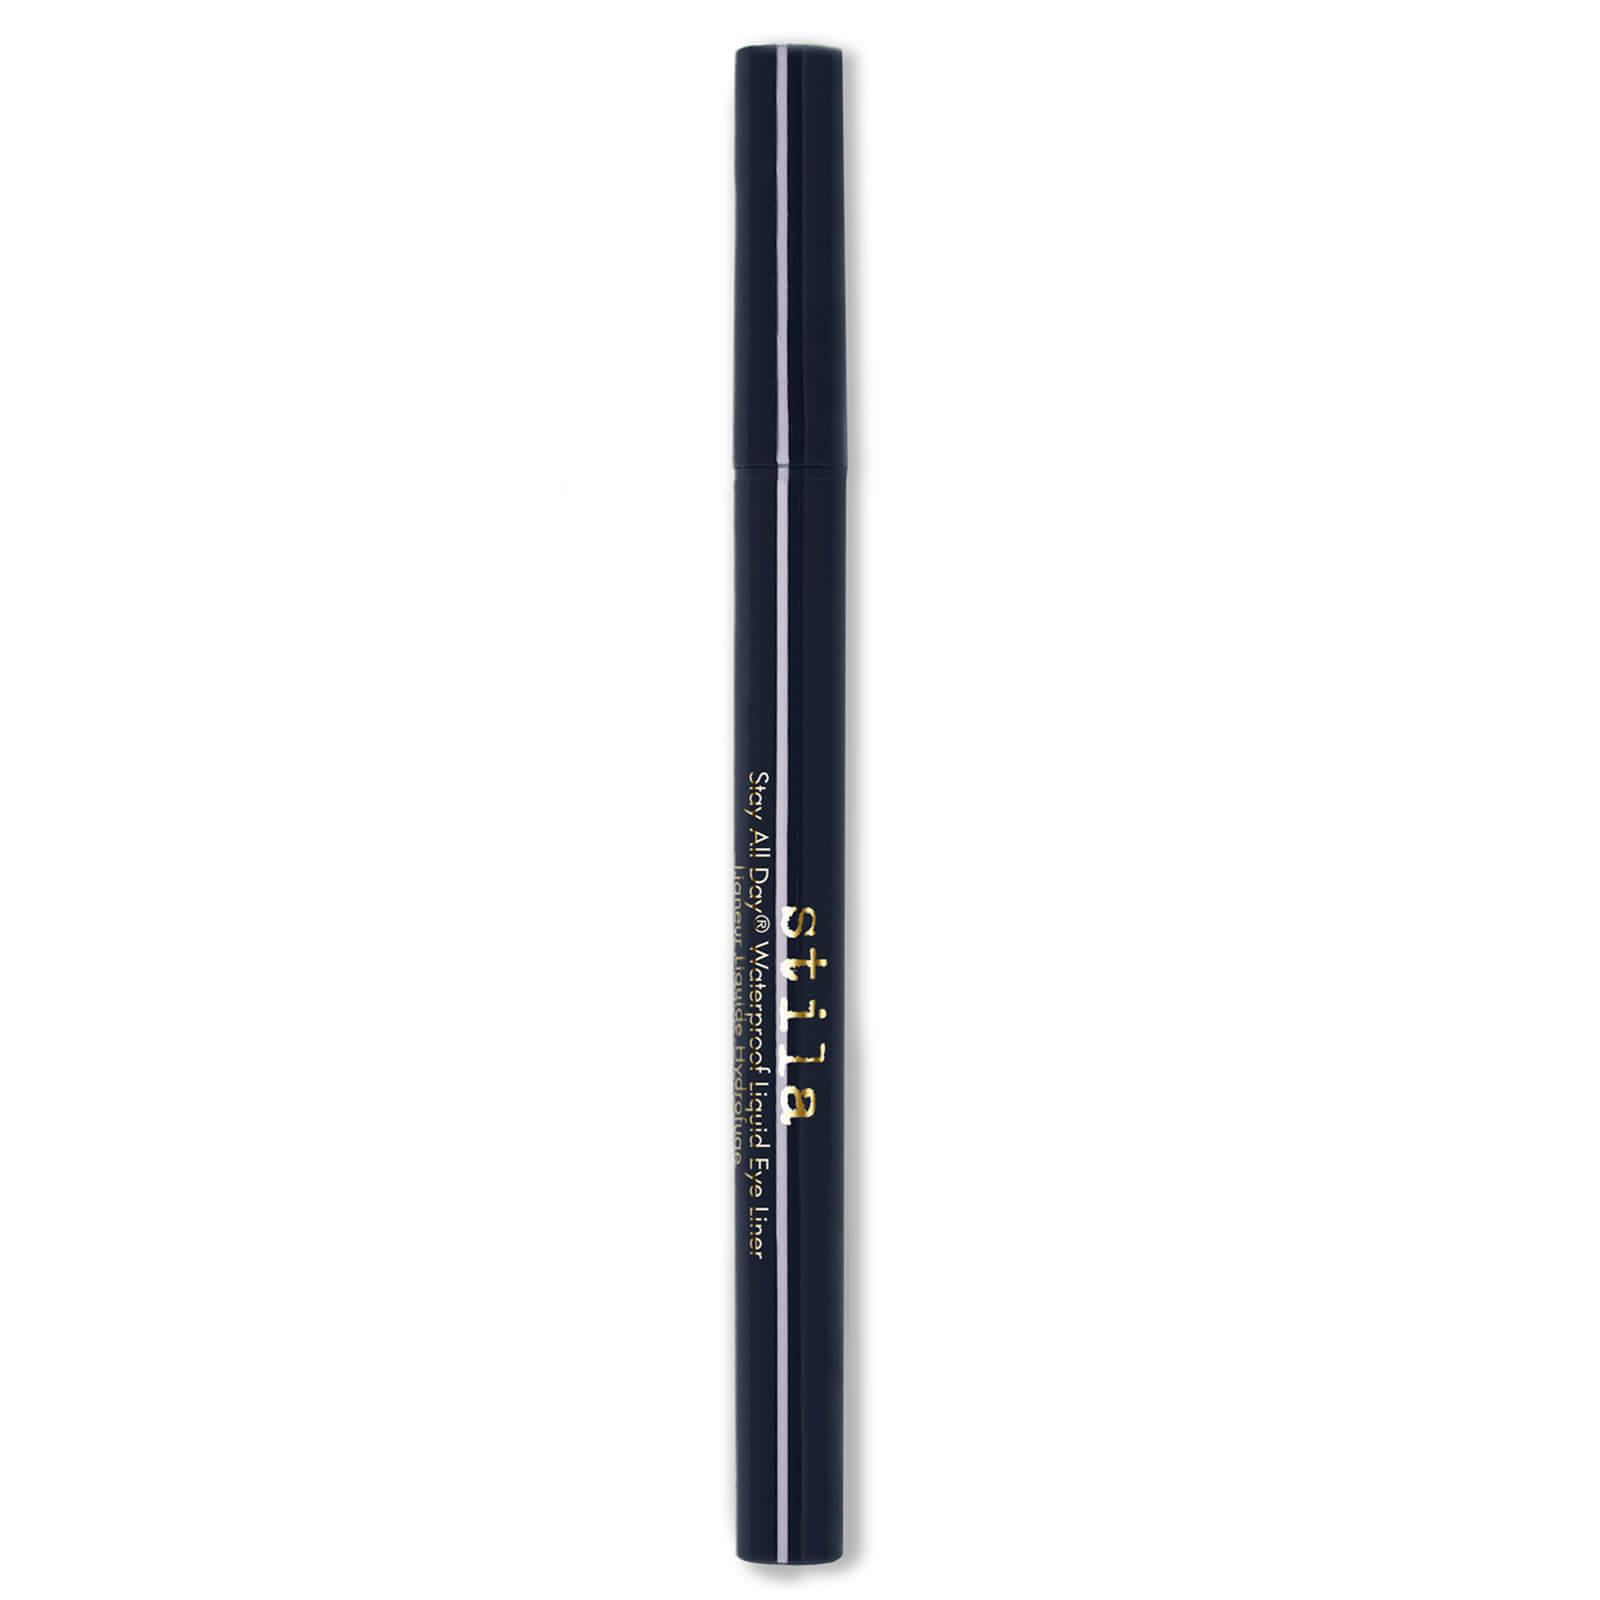 Купить Stila Stay All Day Waterproof Liquid Eye Liner (Various Shades) - Intense Sapphire